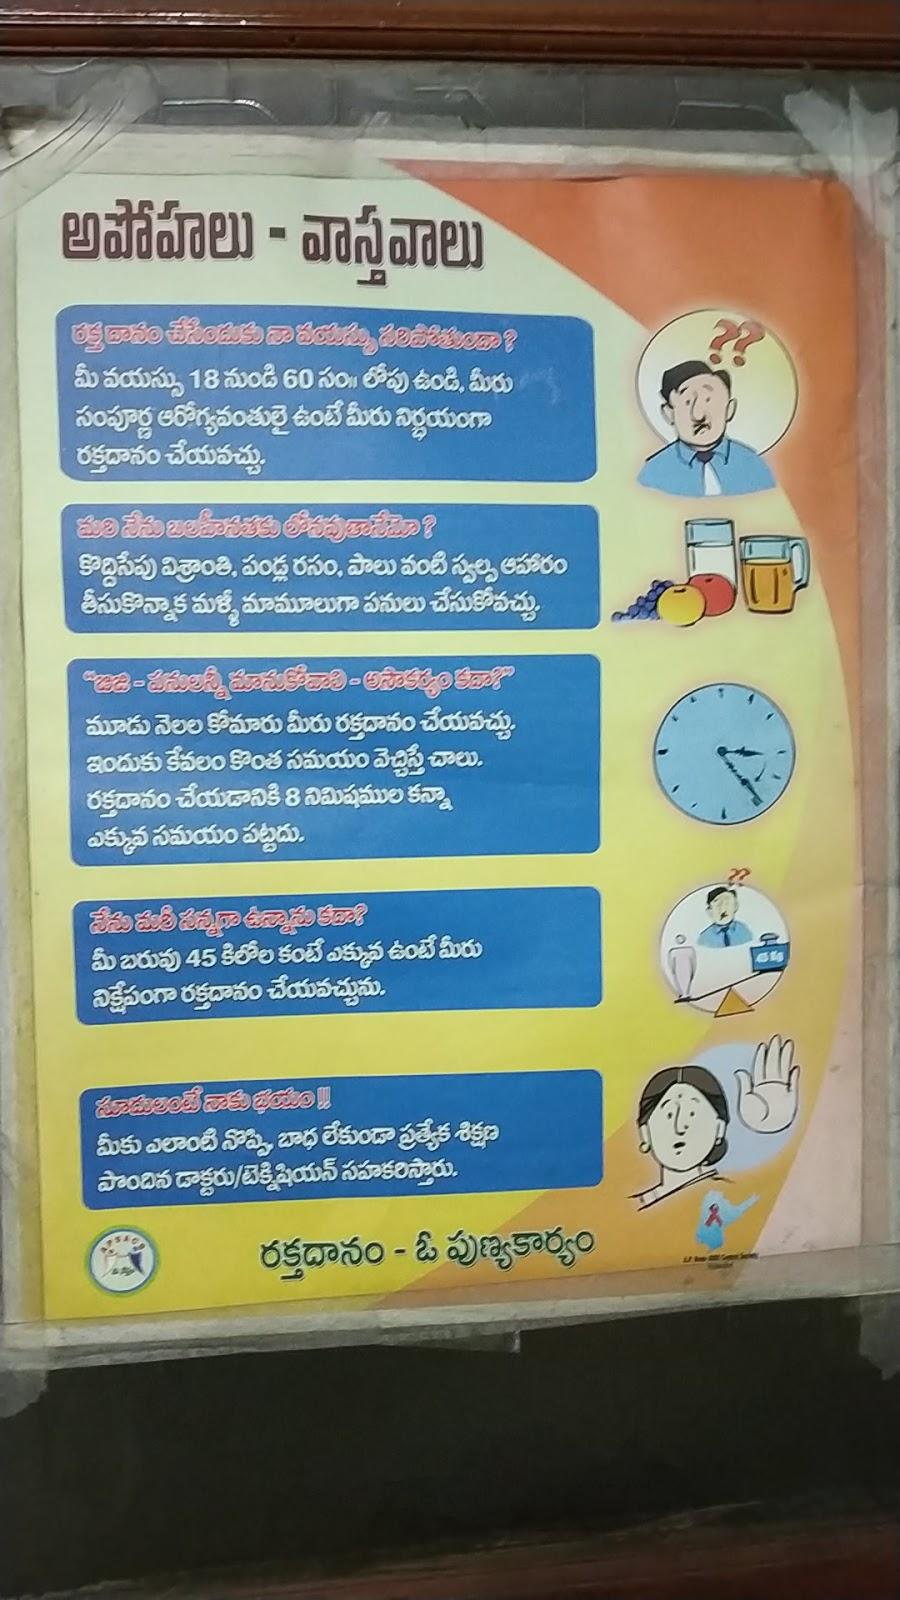 blood bank Life Voluntary Blood Bank near Hyderabad Telangana